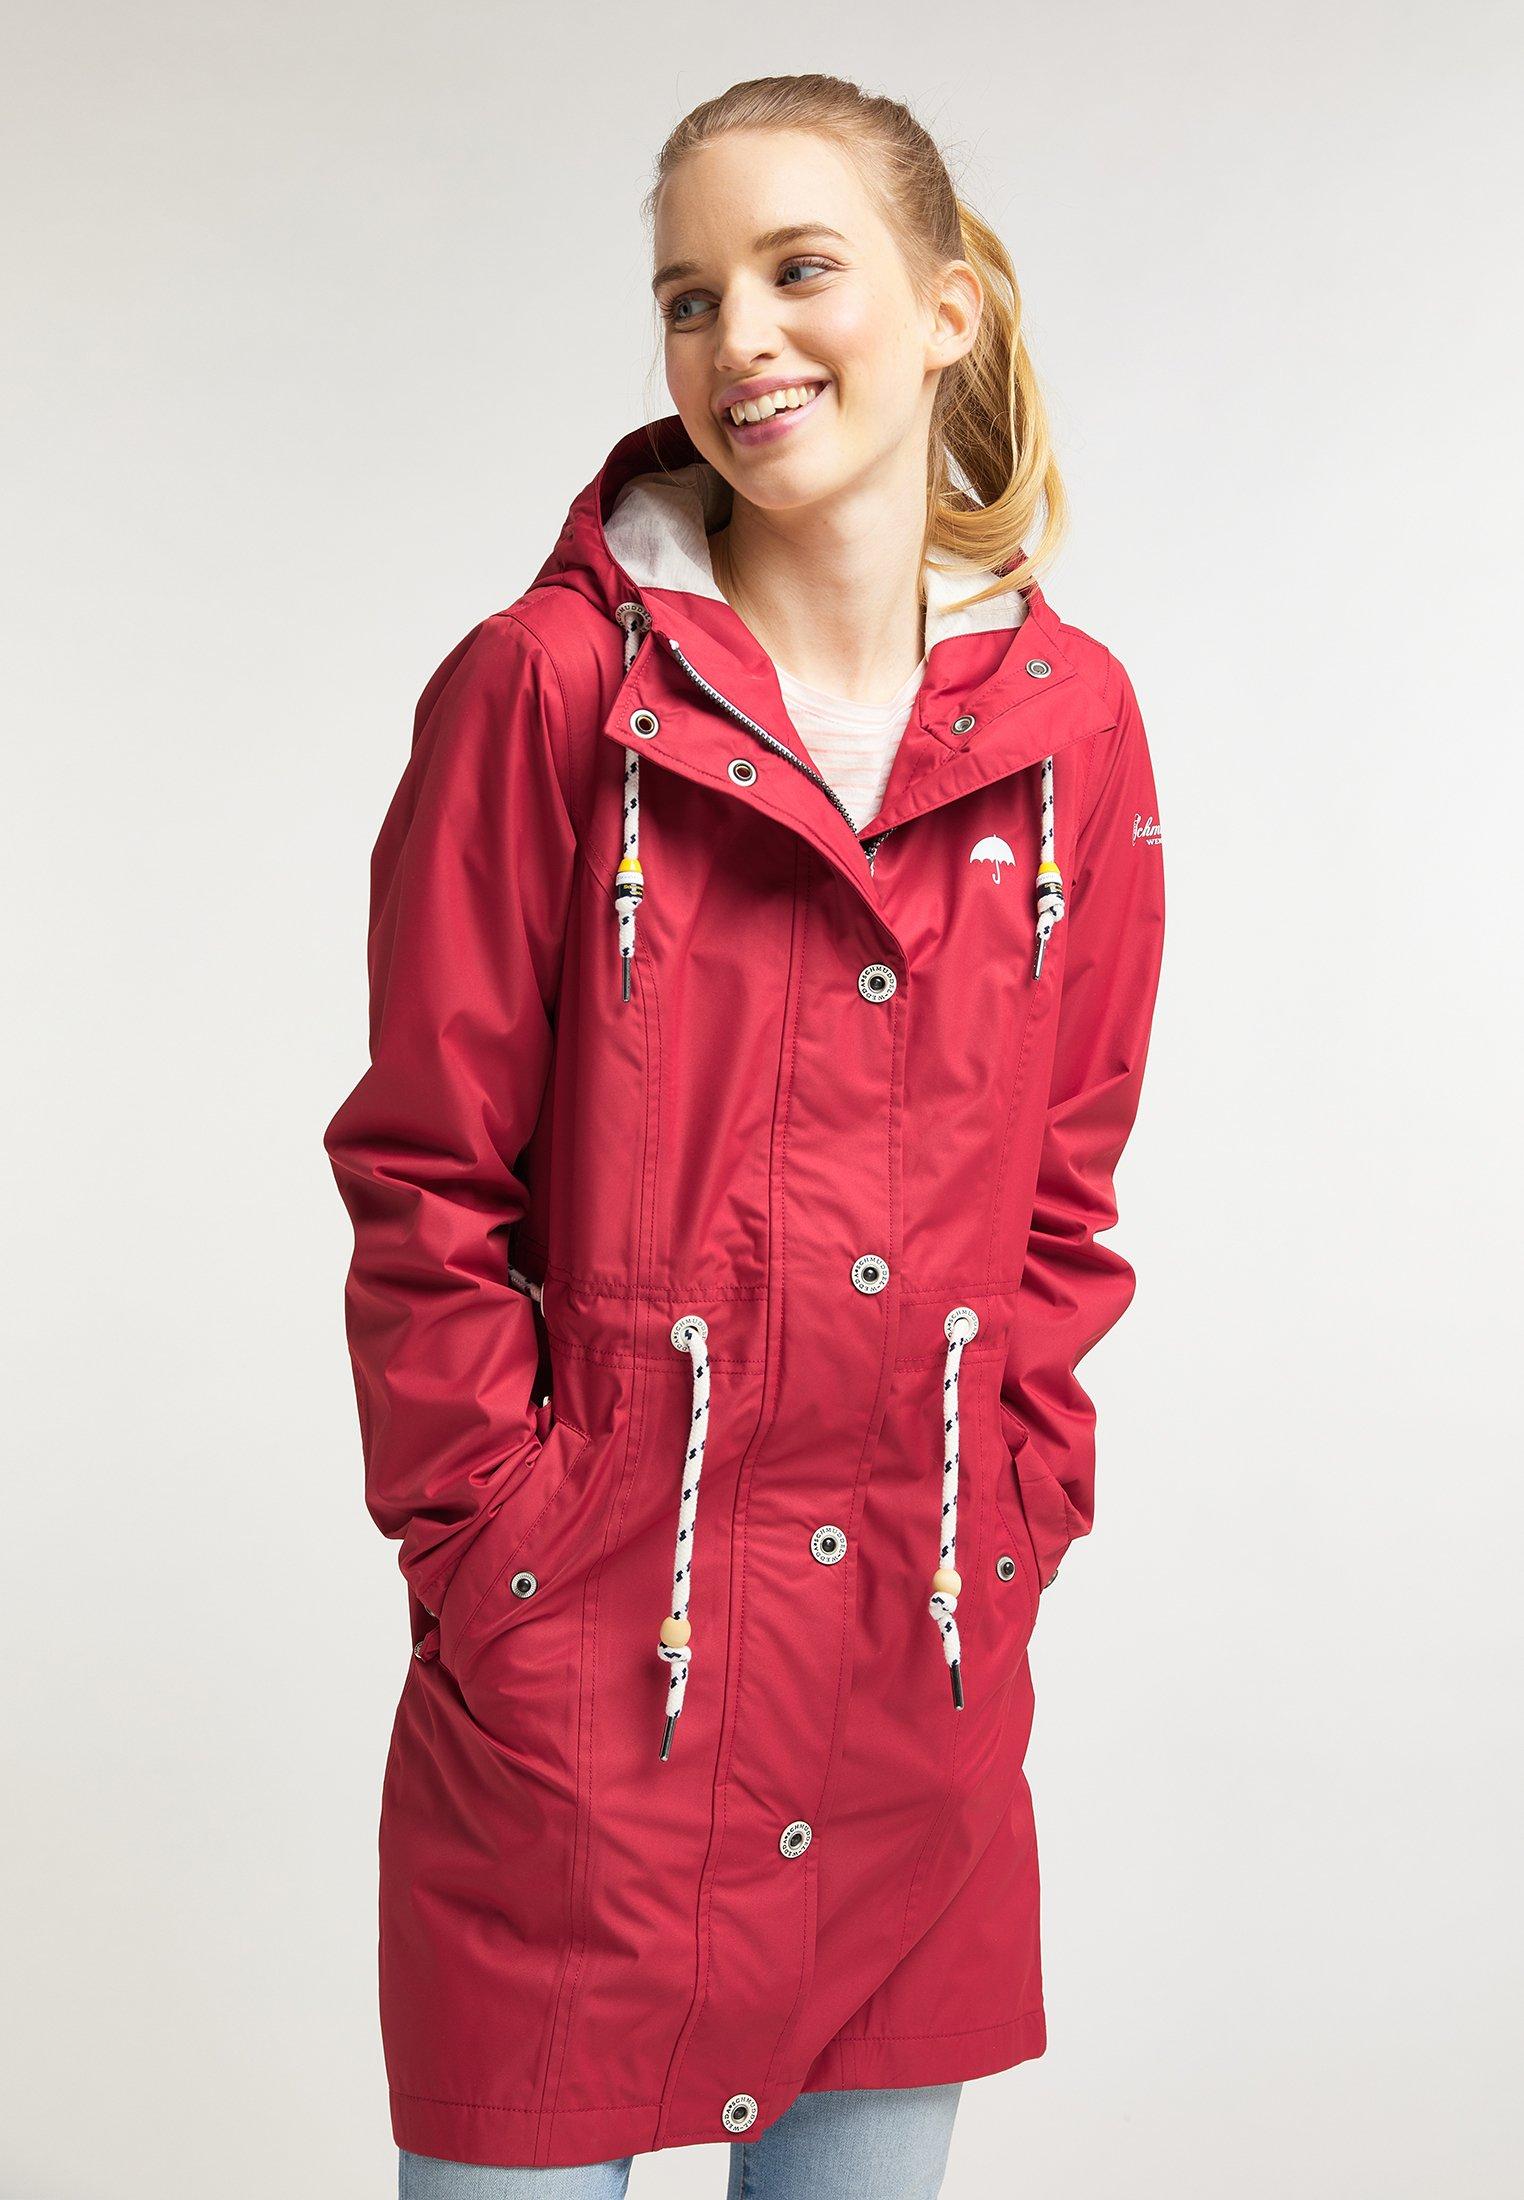 New Arrival Lowest Price Women's Clothing Schmuddelwedda MIT MAGICPRINT Parka red OUhXSd0xi QlhKBYQJa